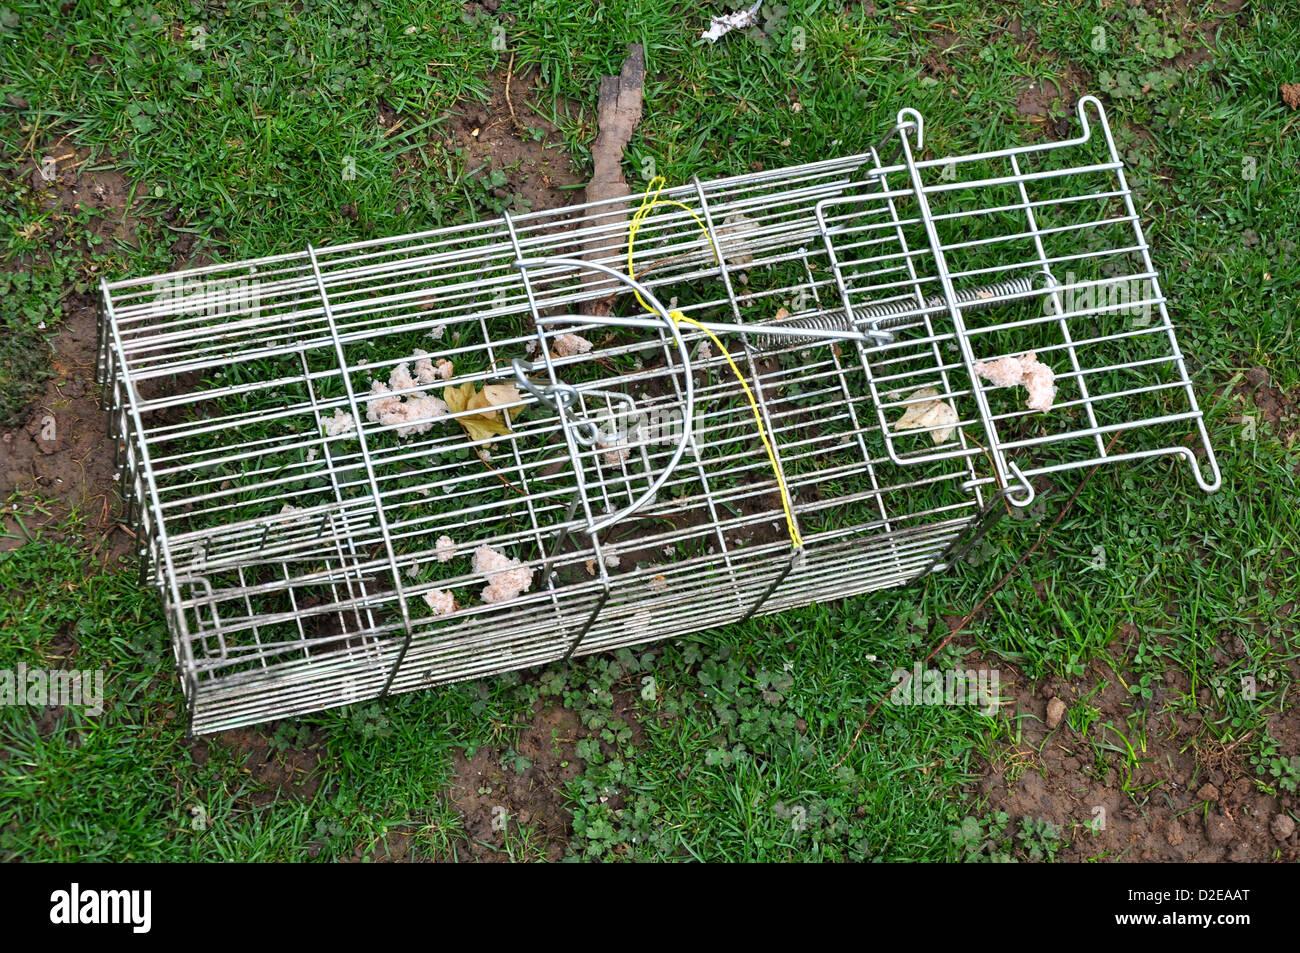 A humane rat trap - Stock Image